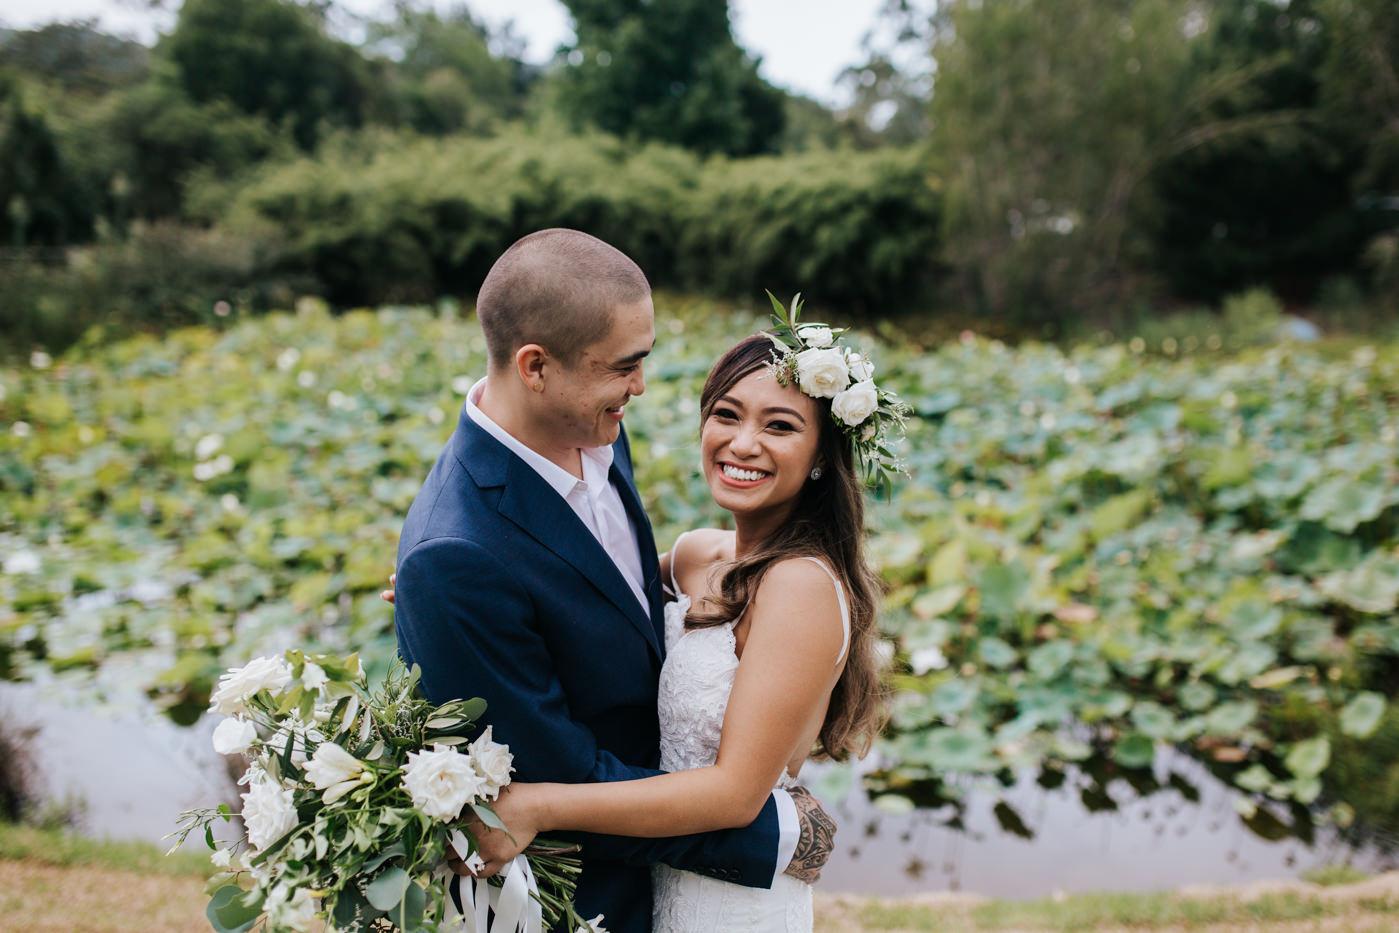 Nick & Vanezza - Fernbank Farm Wedding - Samantha Heather Photography-88.jpg